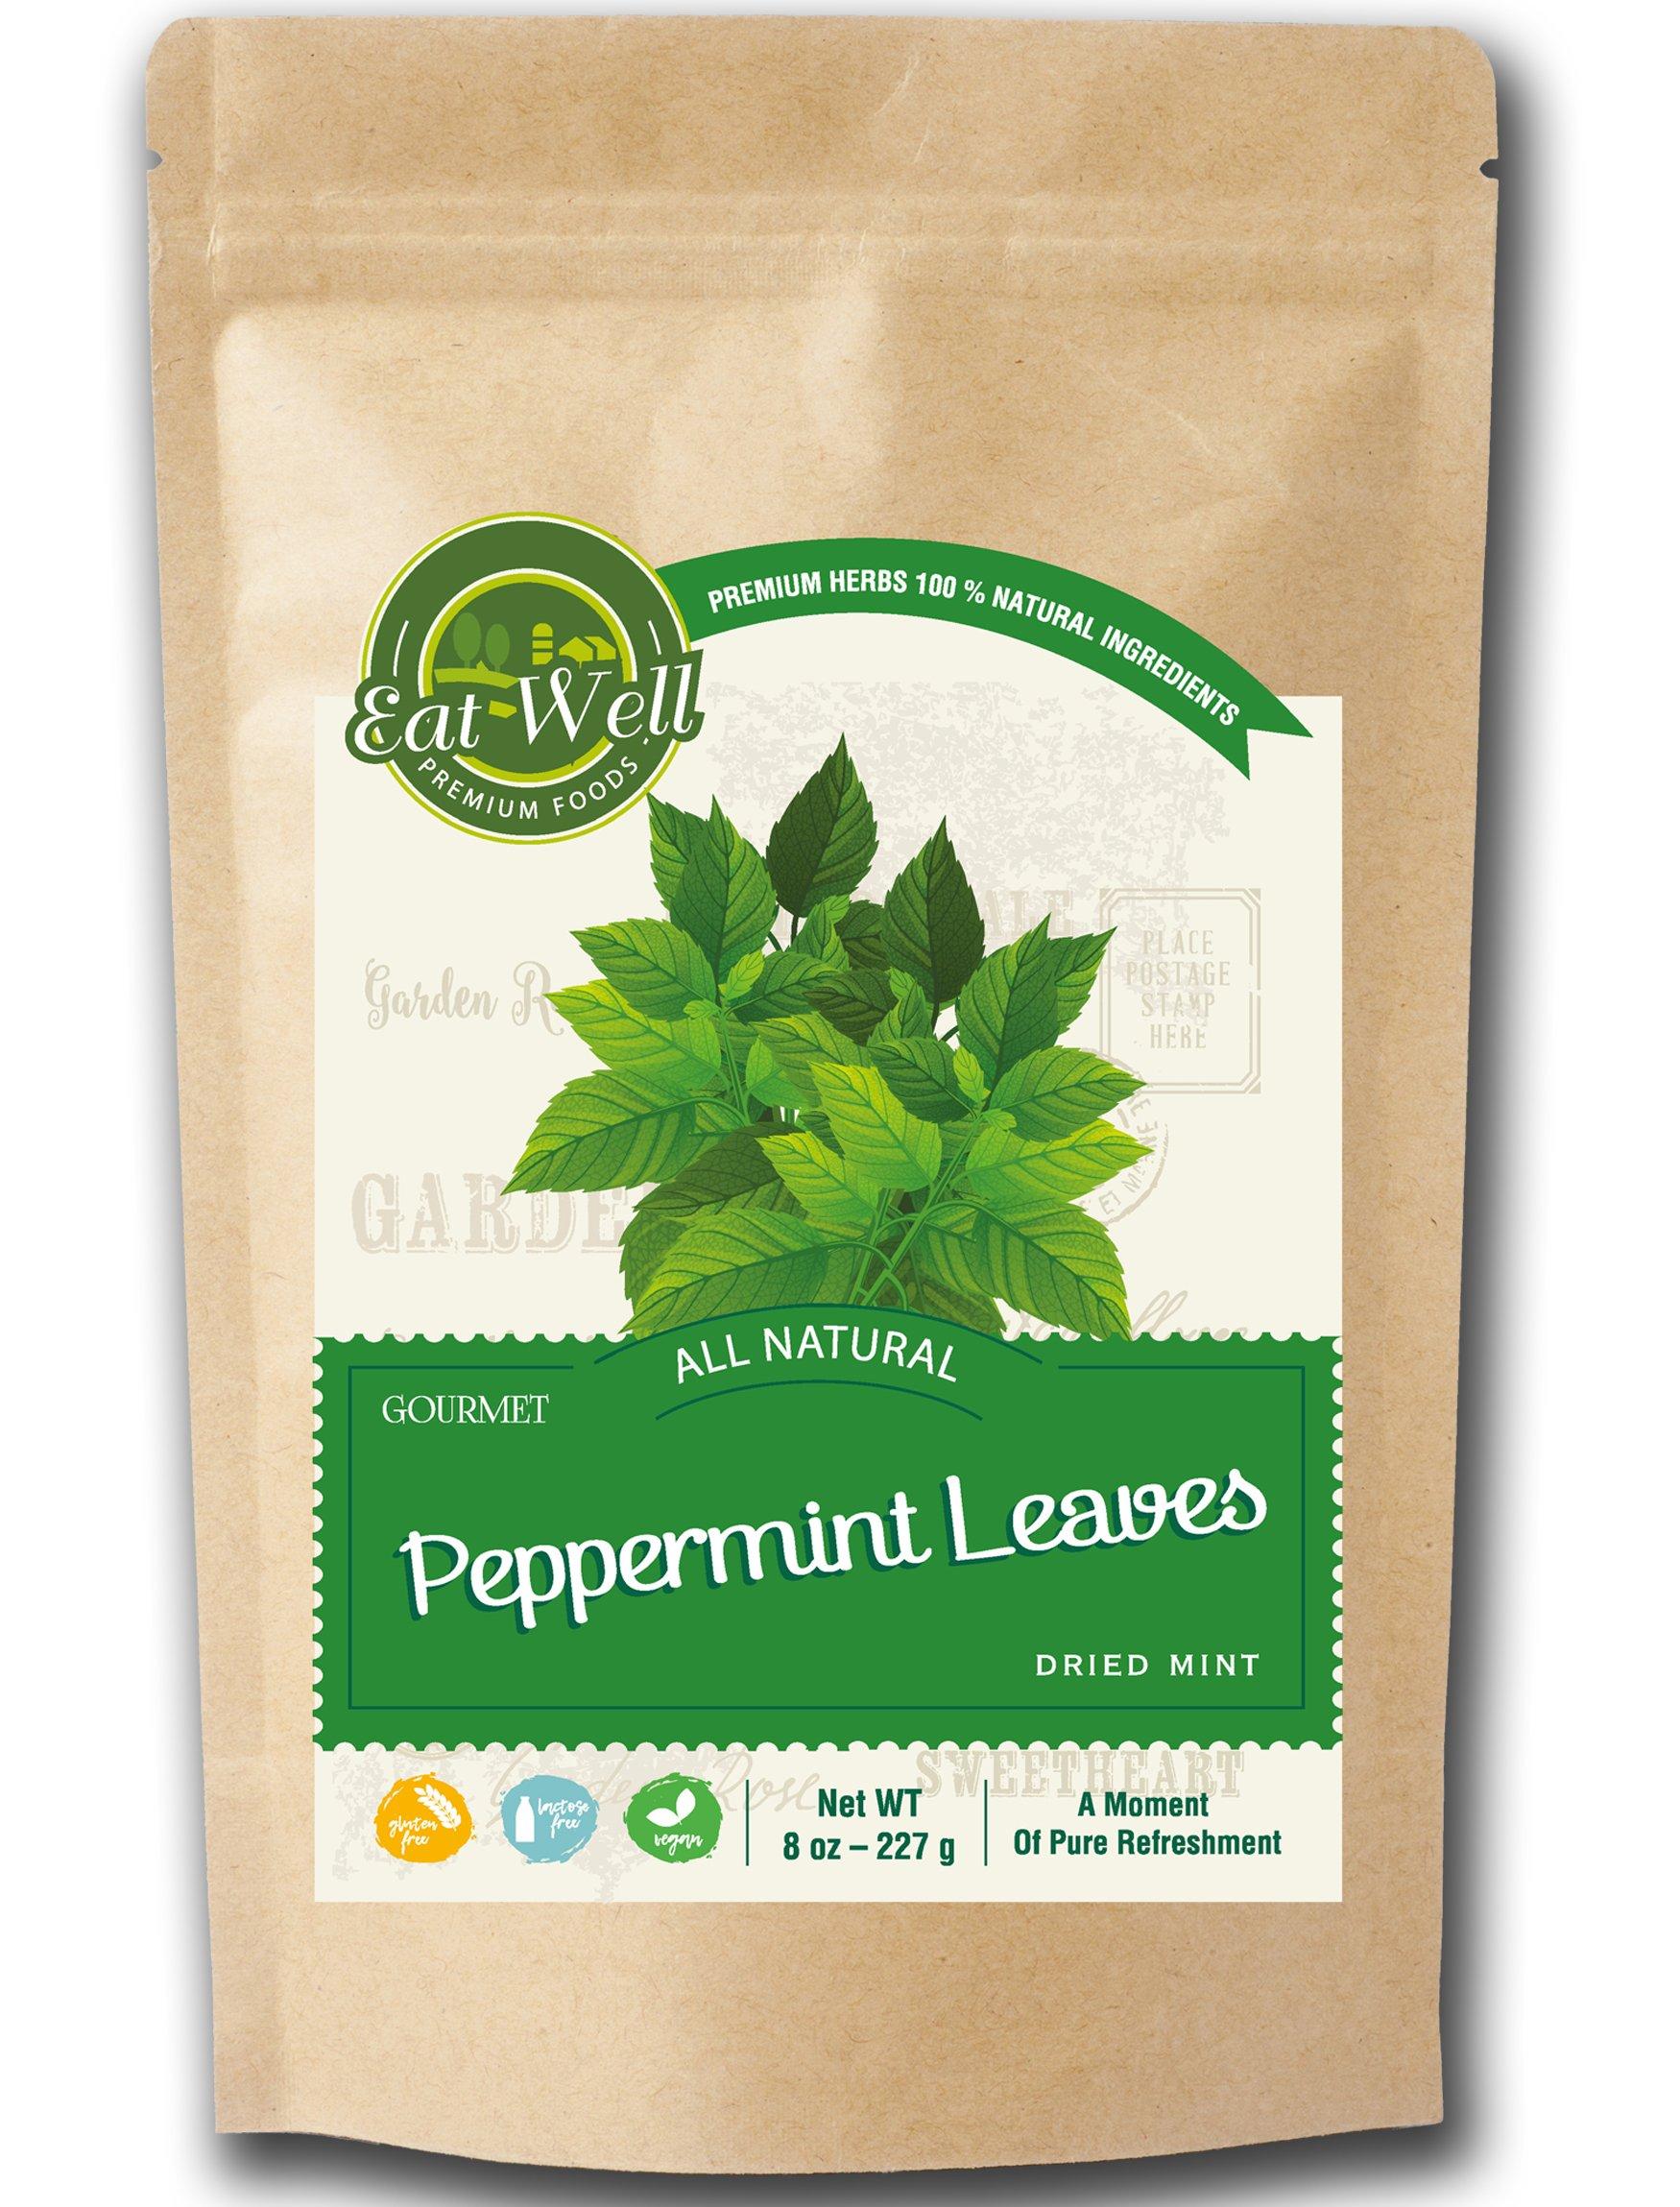 Crushed Mint Leaves | 8 oz Reseable Bag, Bulk | Cut & Sifted, Organic Culinary Dried Mint Leaf | Crushed Peppermint Tea | Menta Piperita | by Eat Well Premium Foods Eat Well Premium Foods